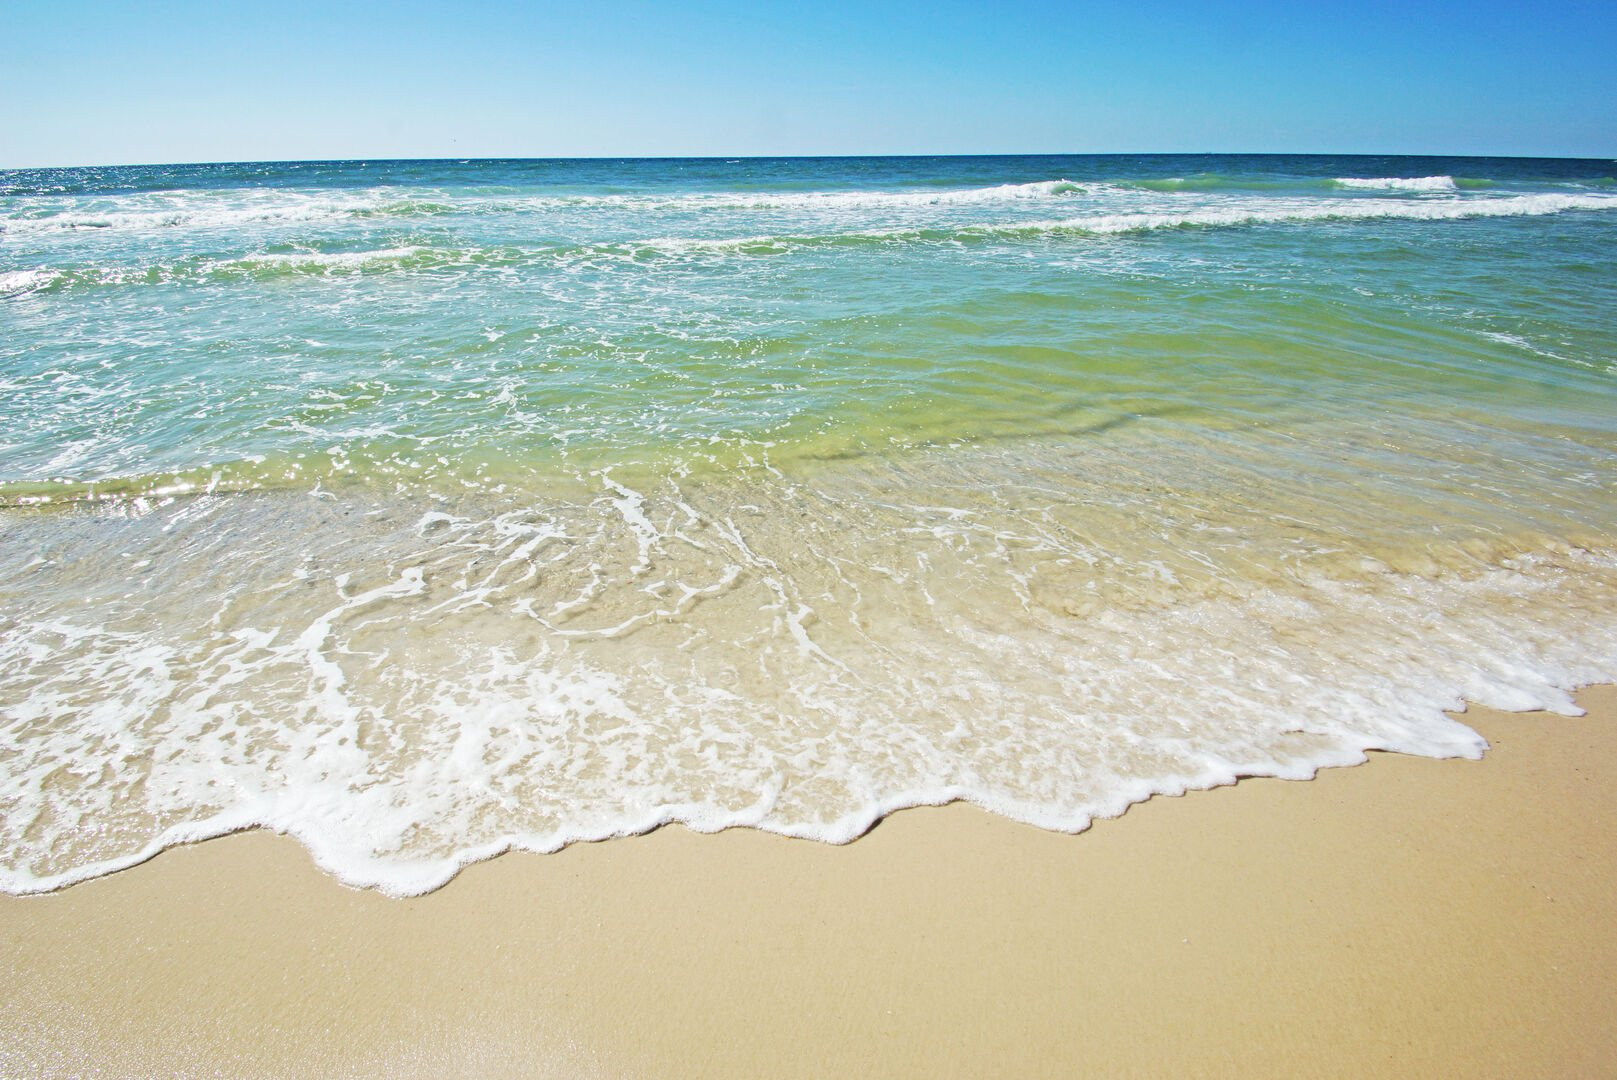 Waves on Beach Shore